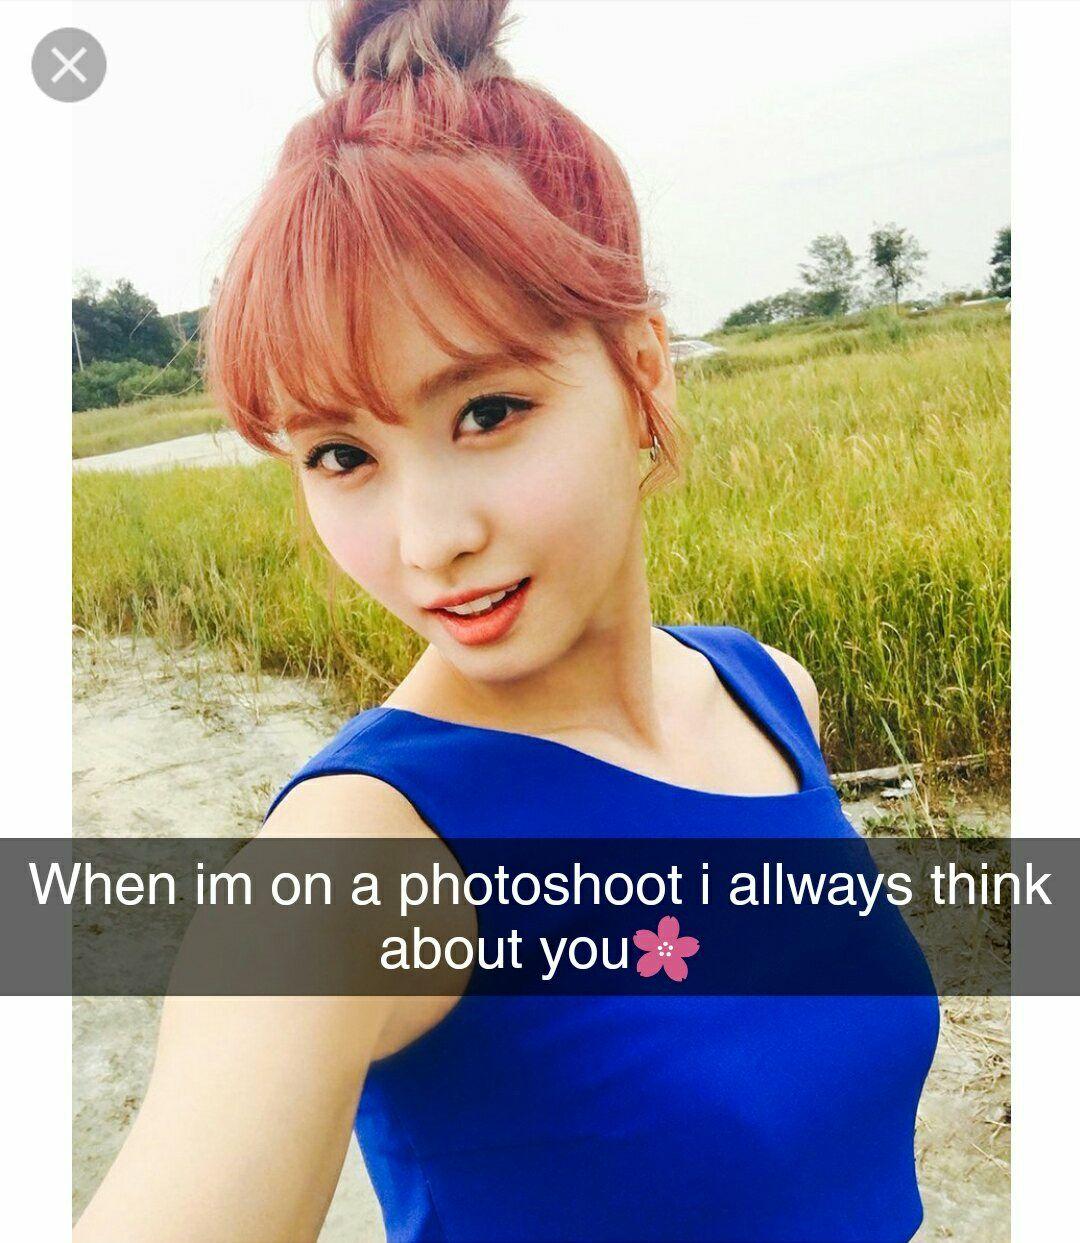 IMAGINES] Twice X Fem! Reader - 3  Twice Snapchat (1) - Wattpad